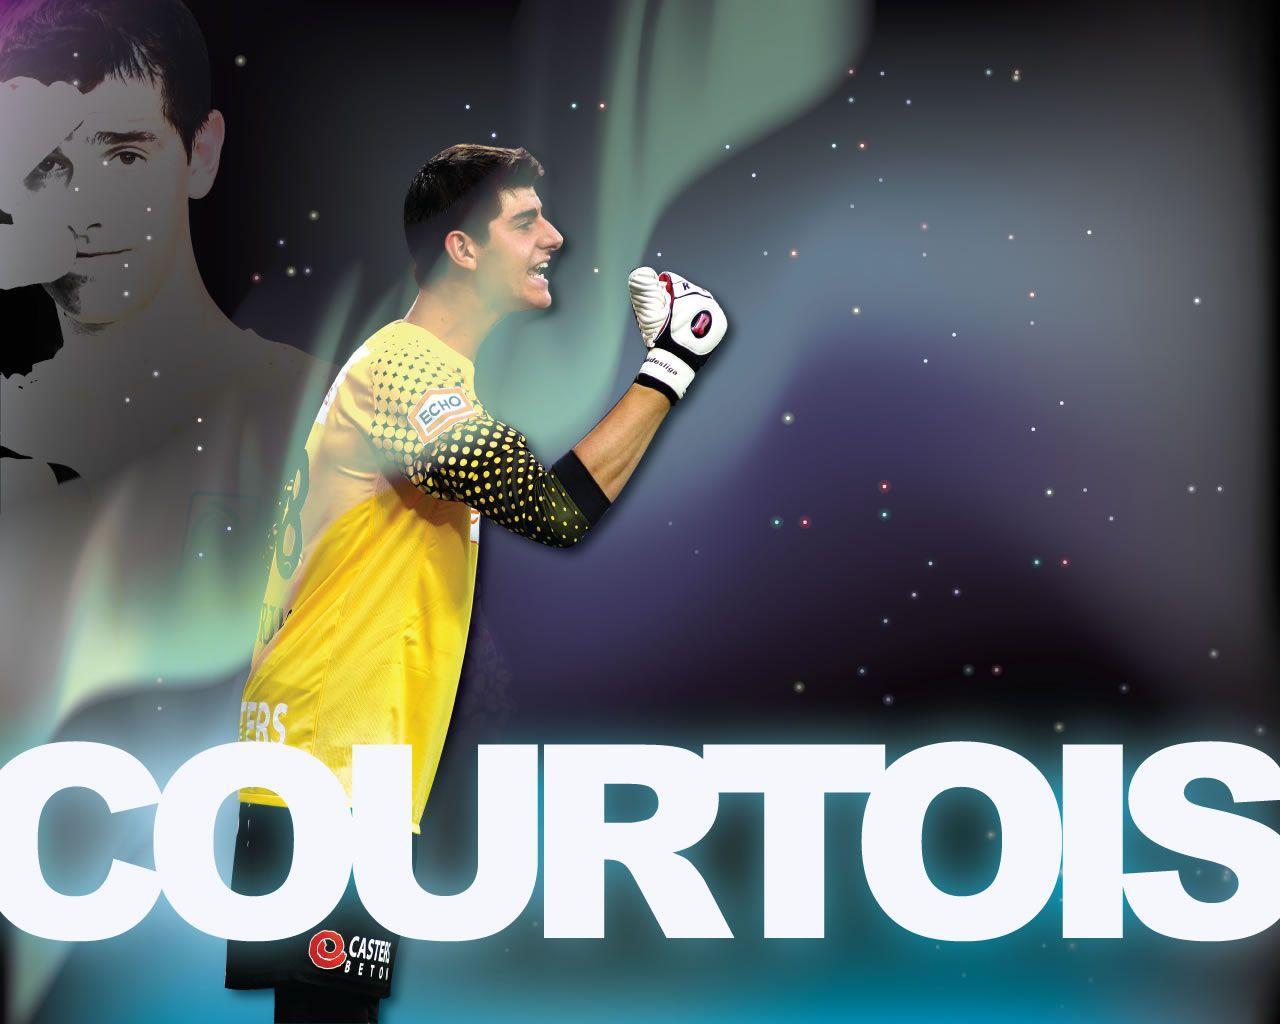 Thibaut Courtois Atletico Madrid Wallpaper